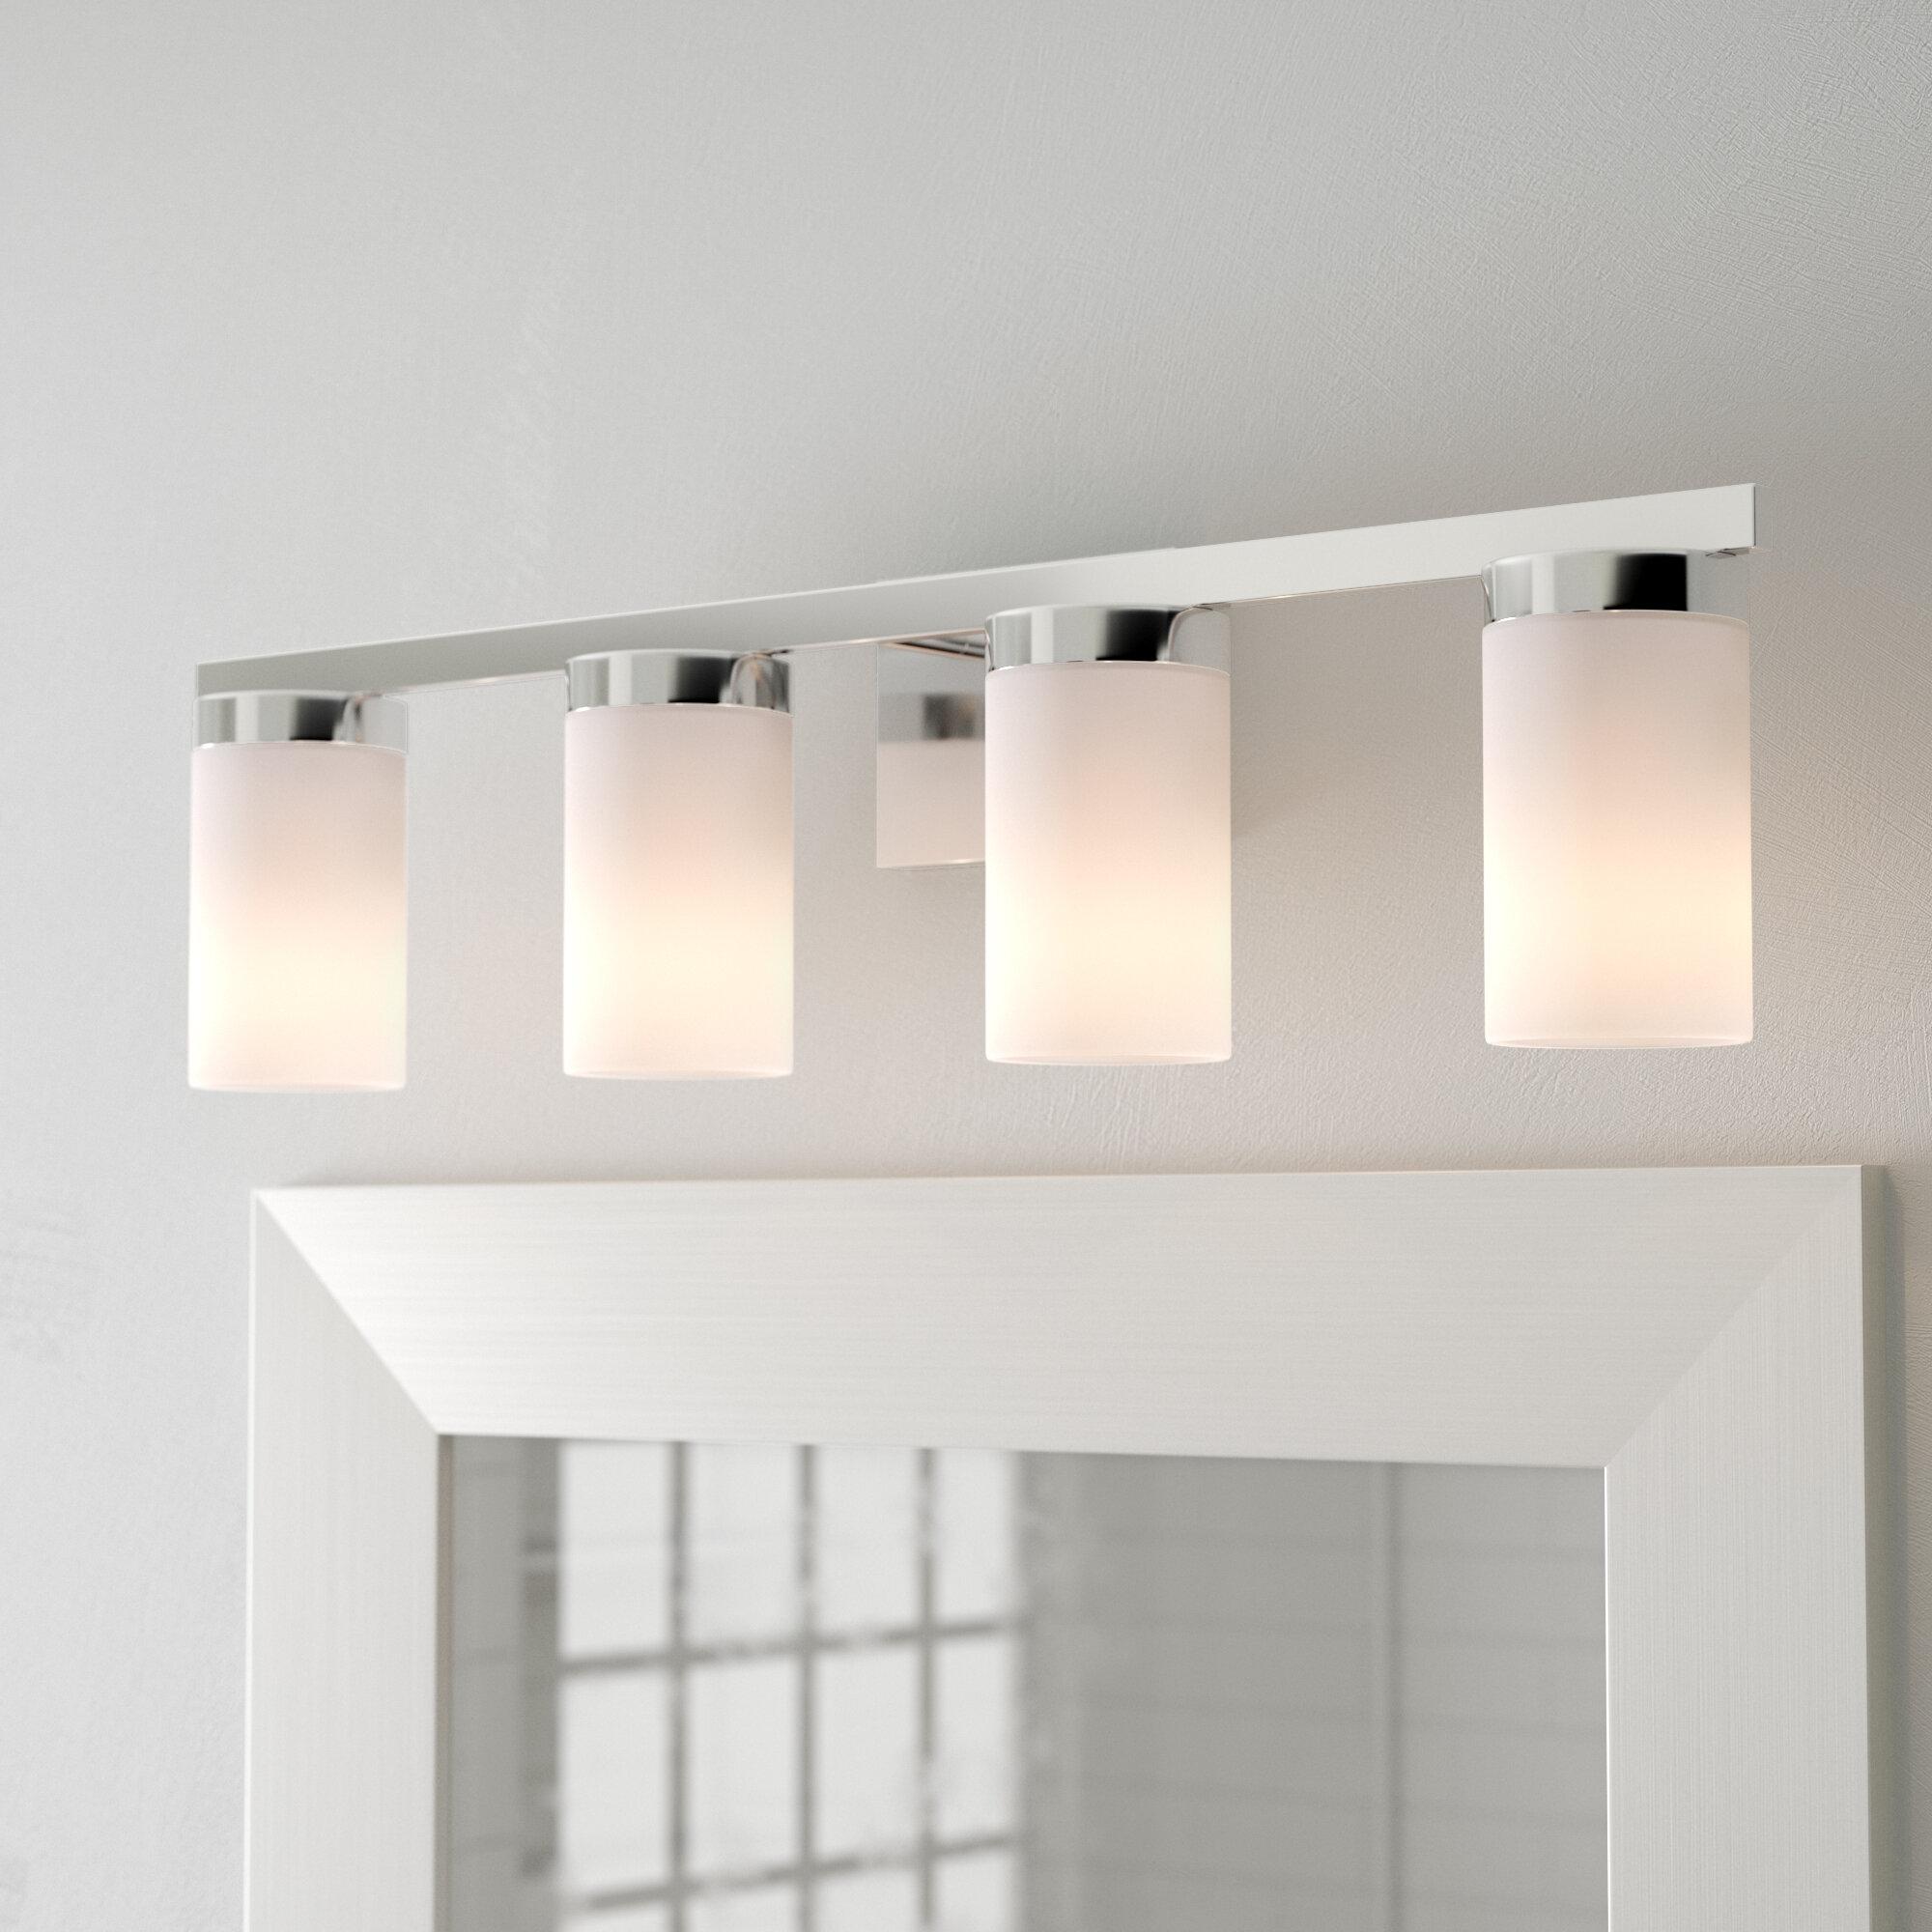 Ivory Cream Shade Bathroom Vanity Lighting You Ll Love In 2021 Wayfair